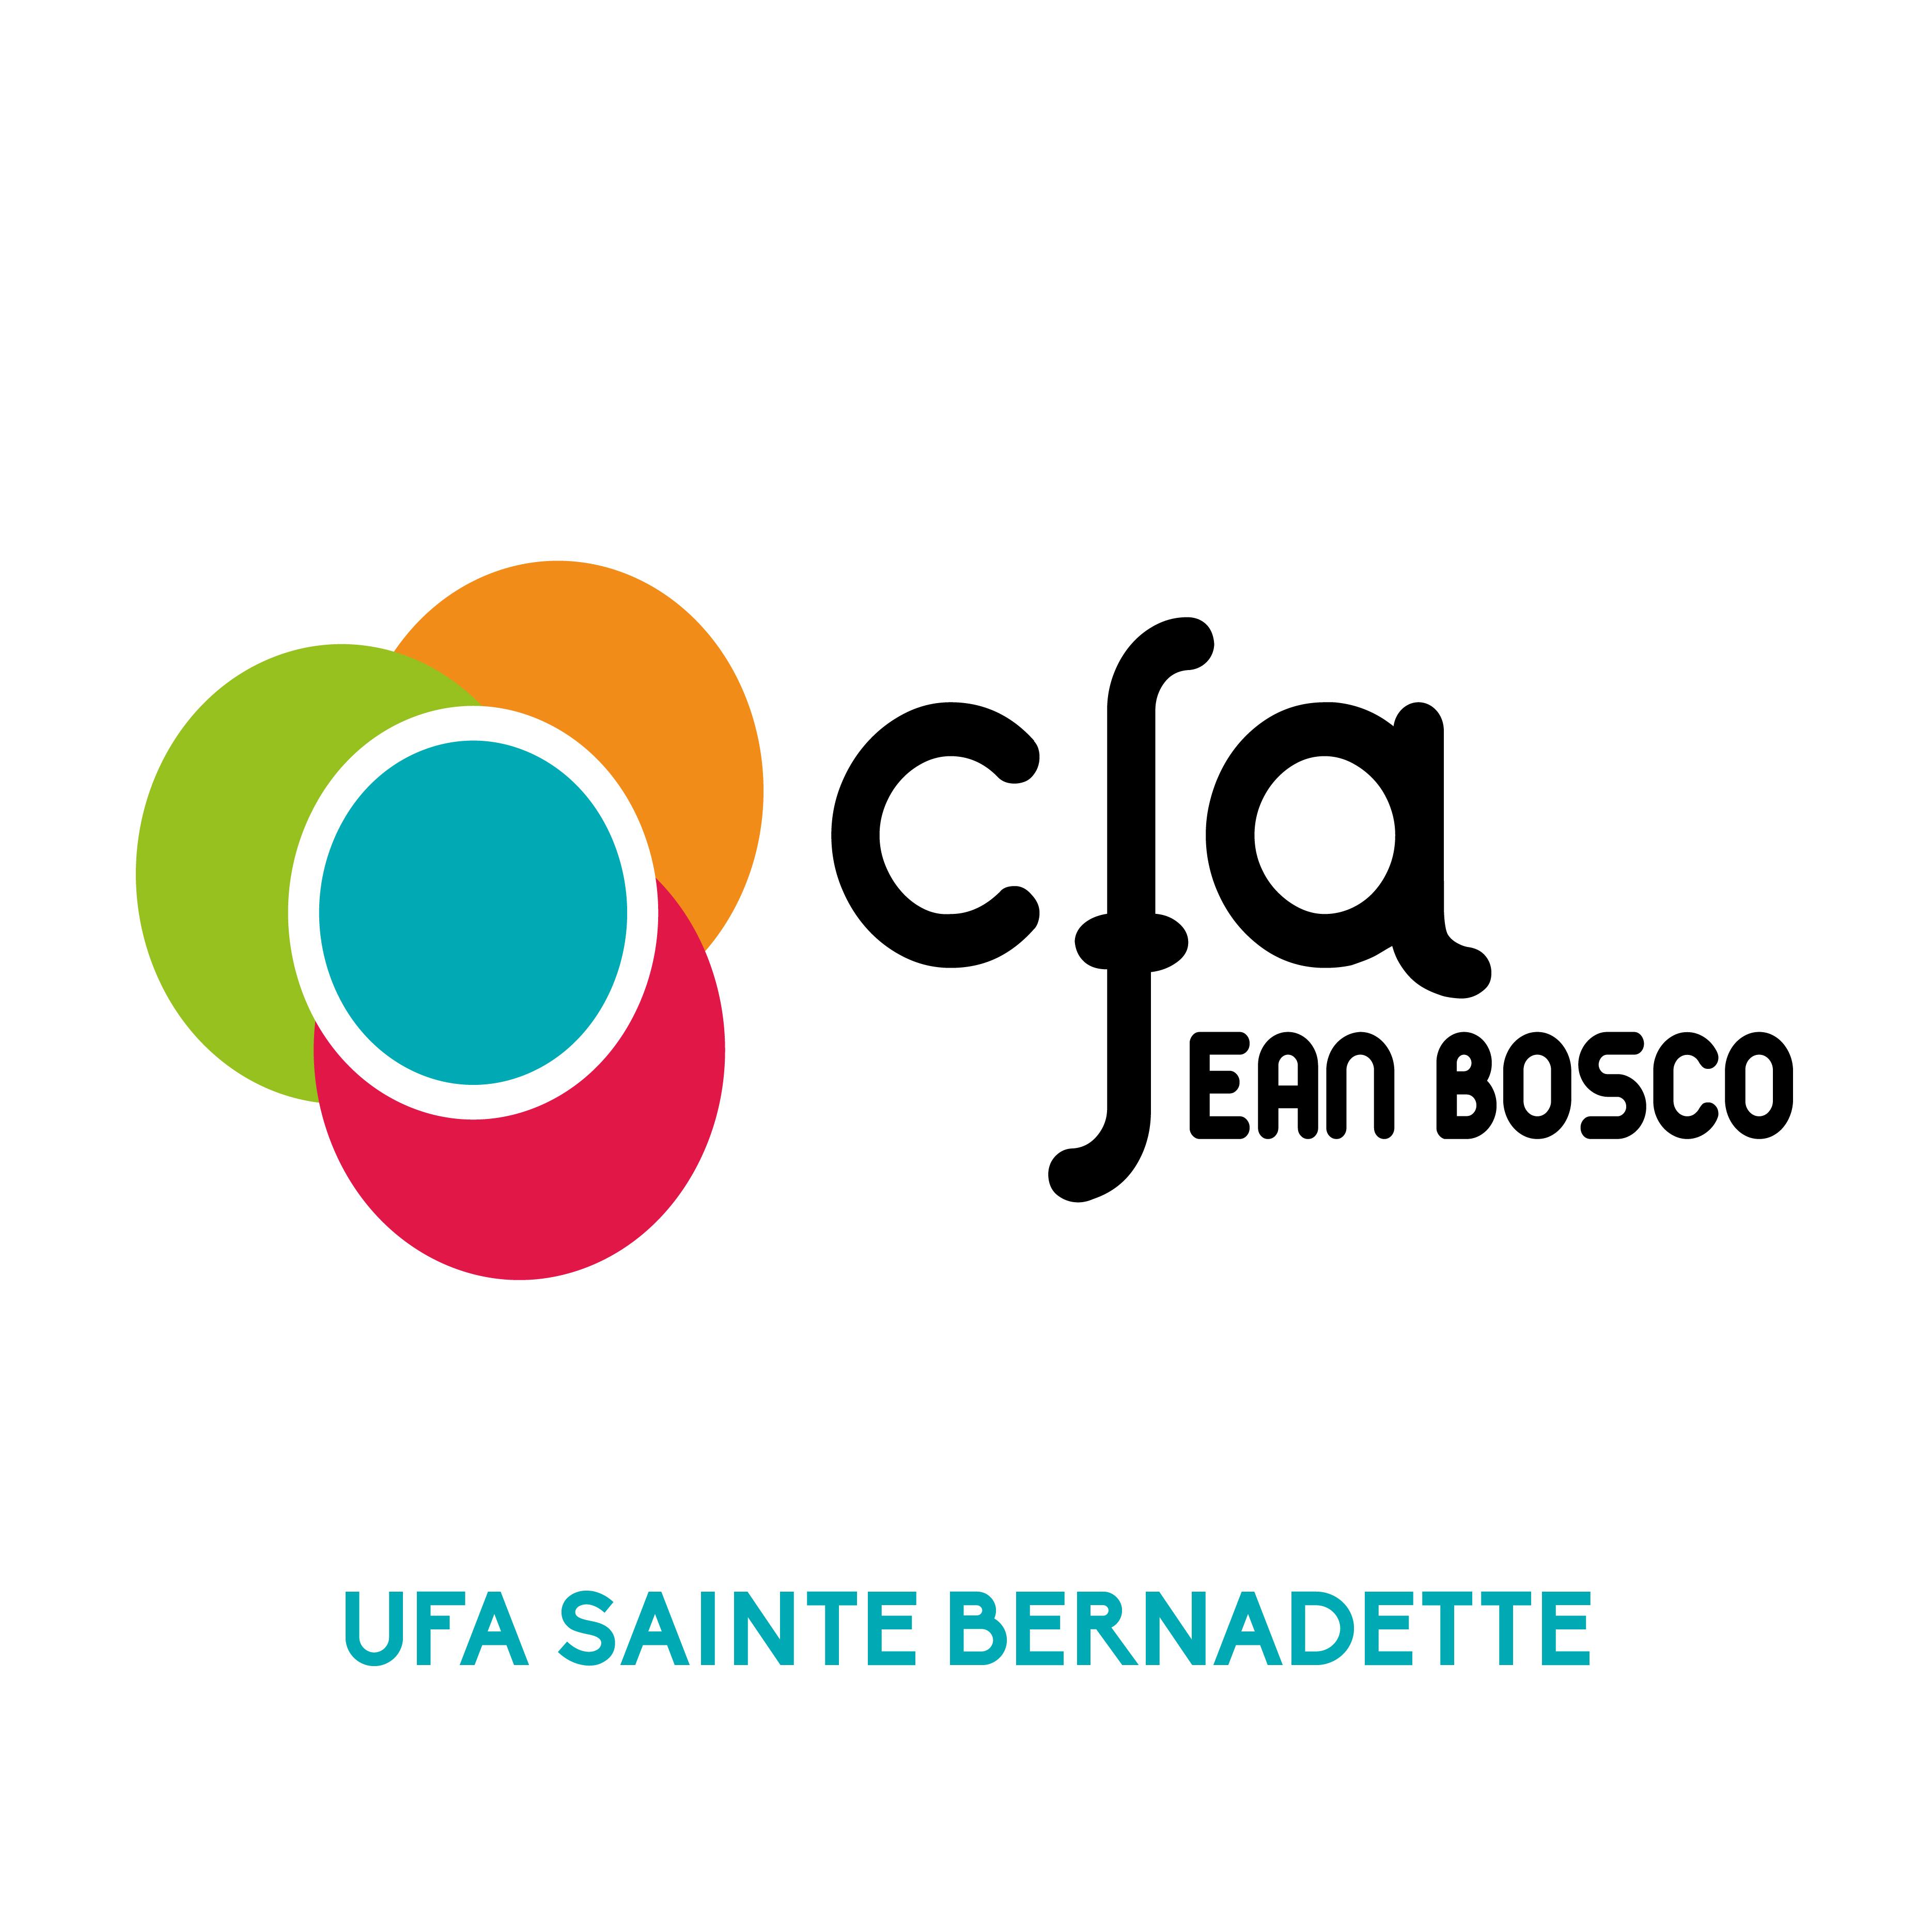 LOGO CFA-SAINTE-BERNADETTE-35